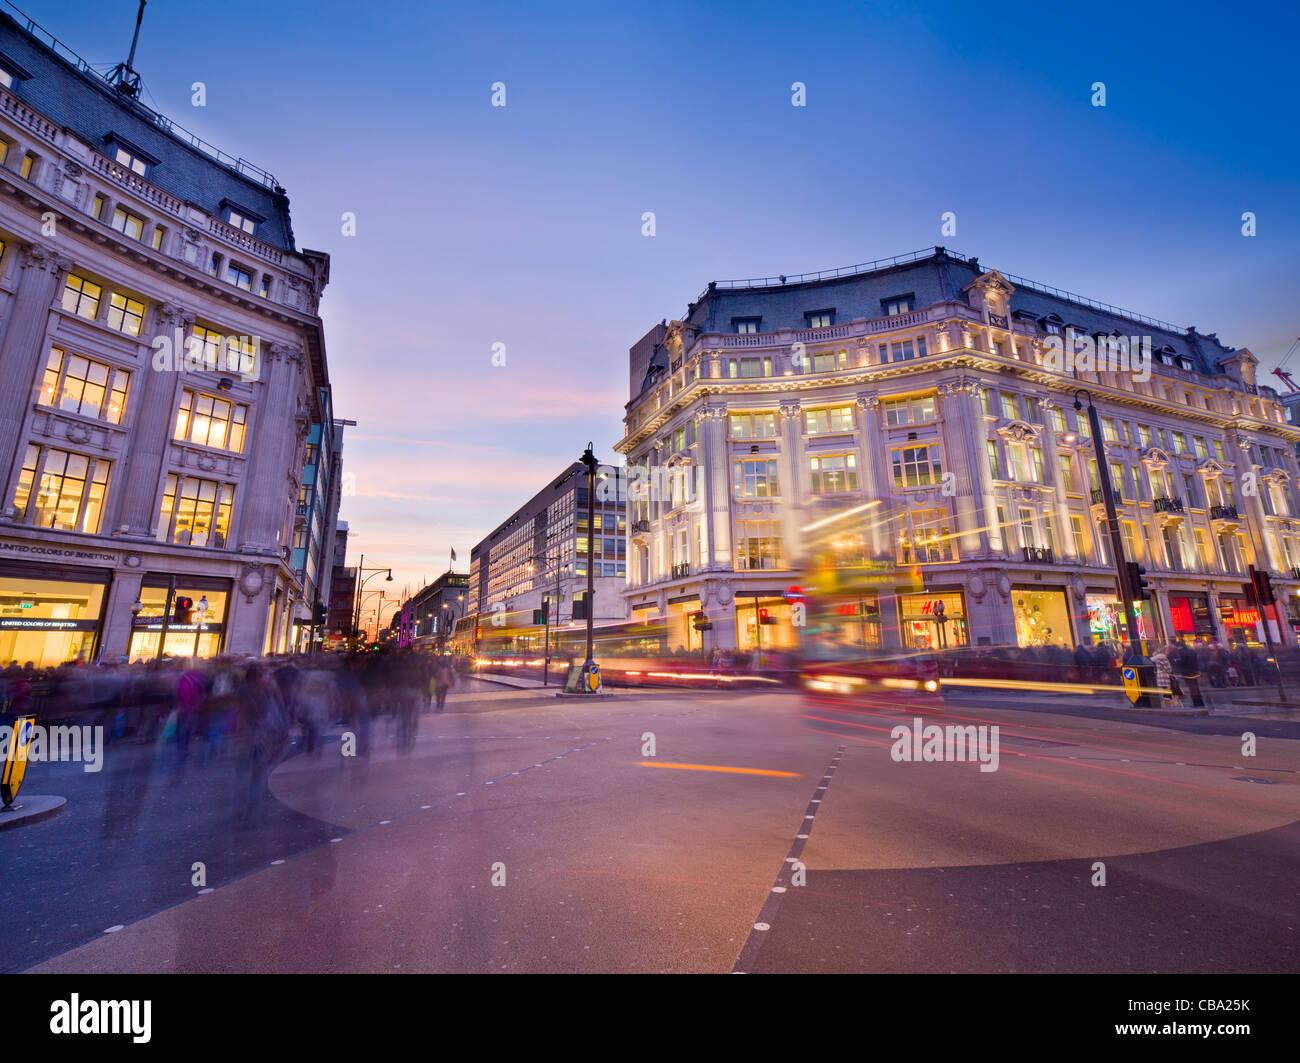 London Oxford Circus - Stock Image